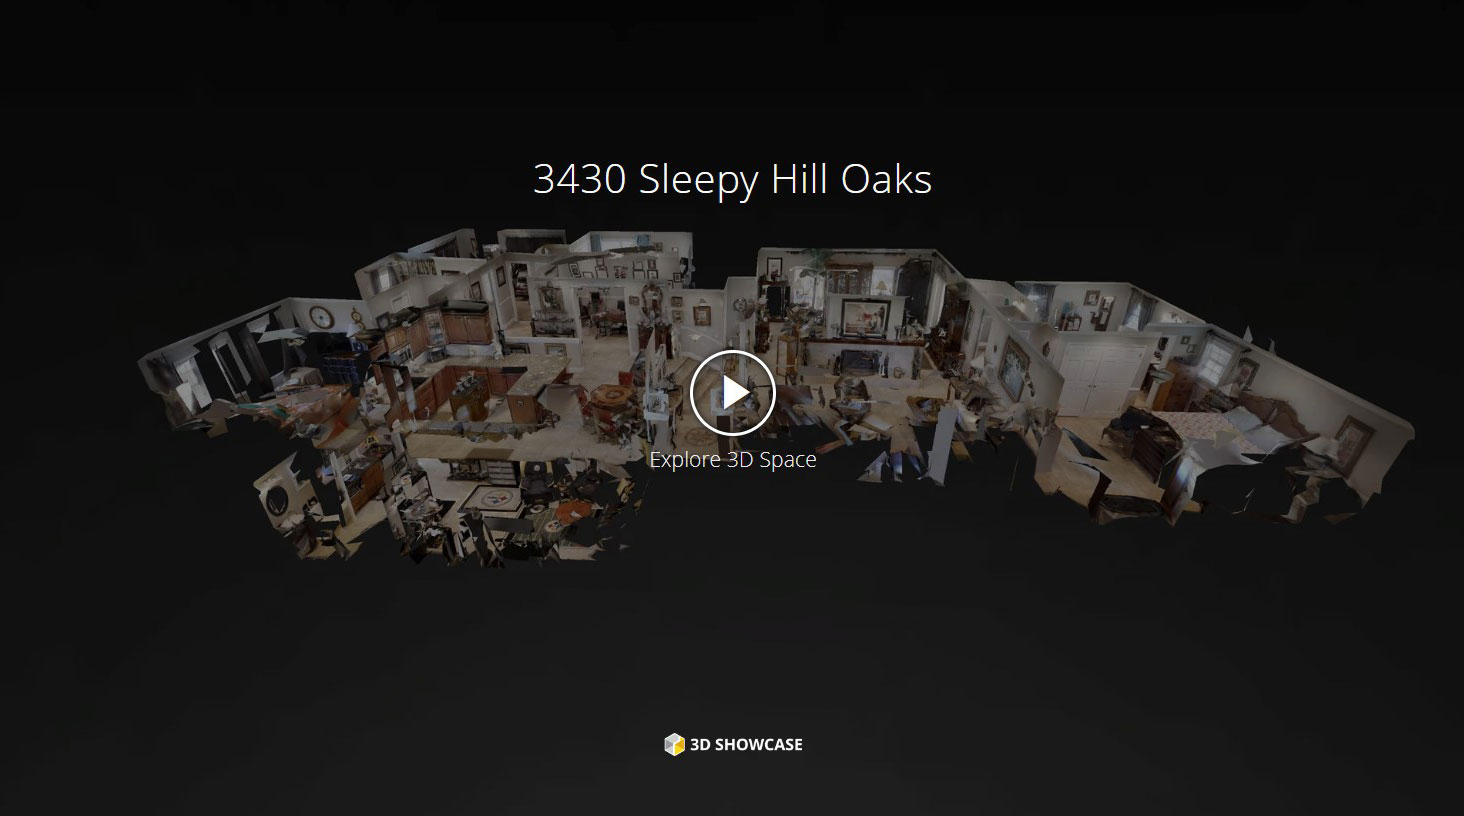 3430 Sleepy hill Oaks - On 8 Acres!